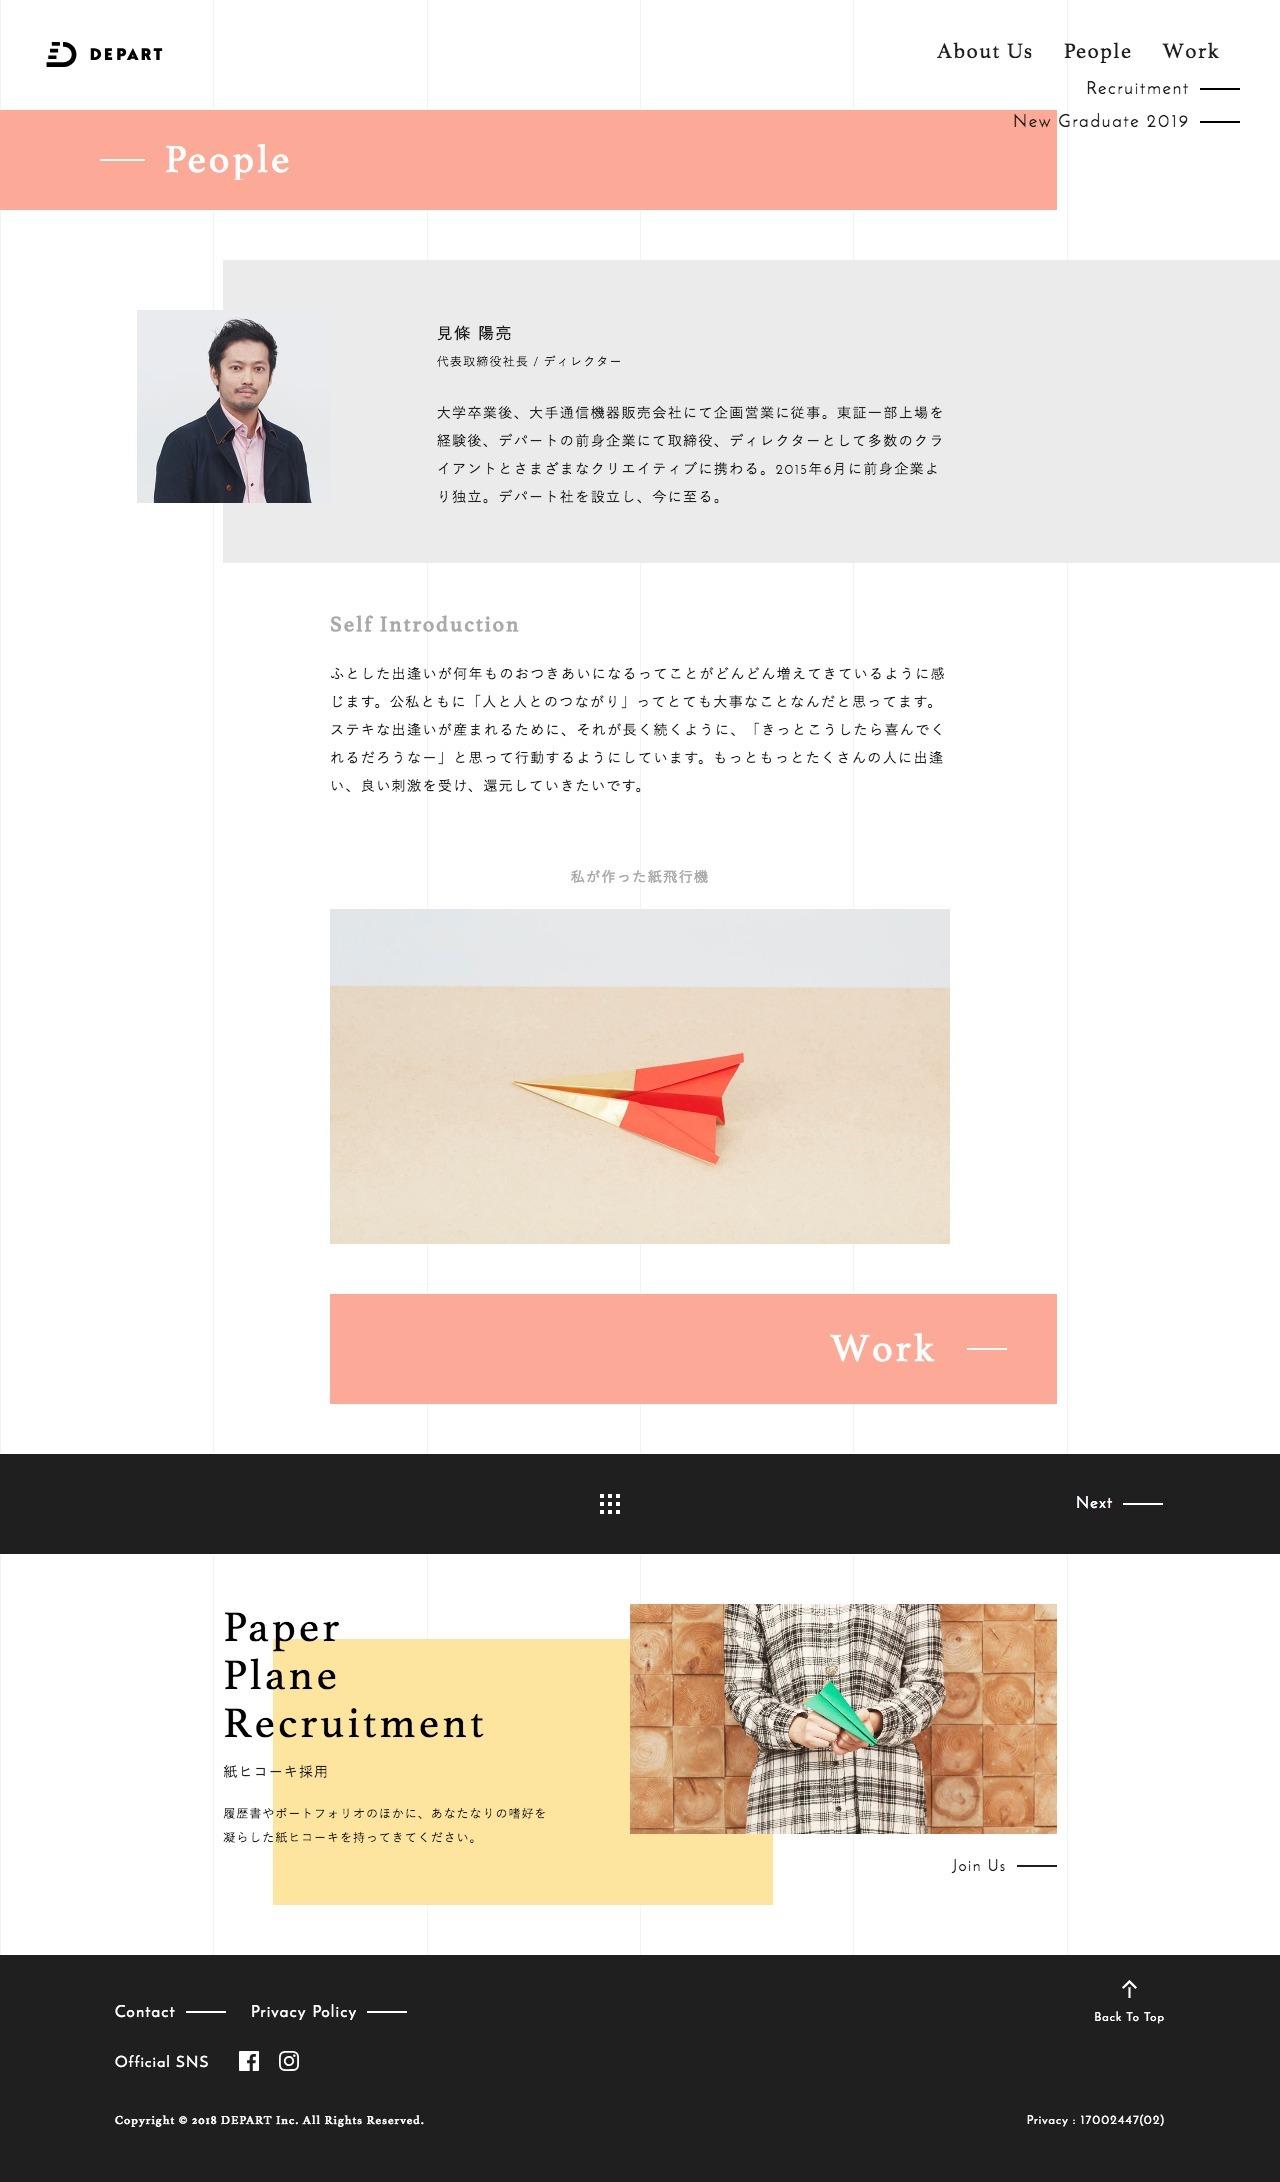 depart-inc-people-page